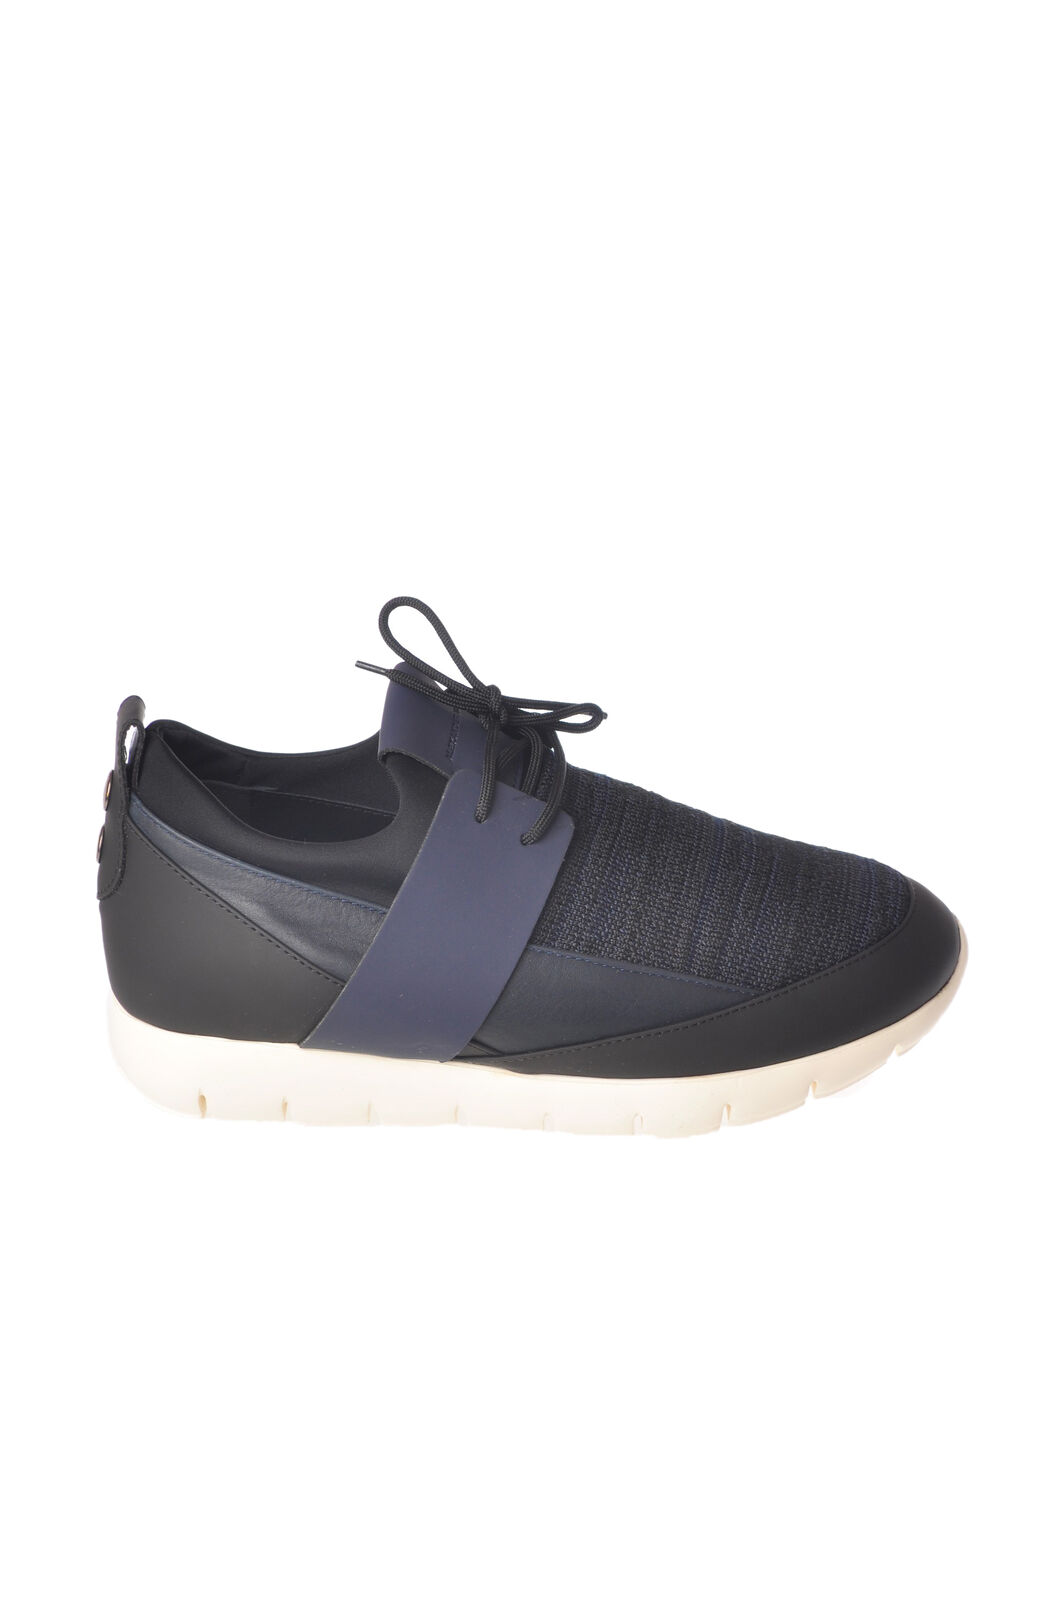 Alexander Smith  -  Turnzapatos - Männchen - azul - 4206527A181707